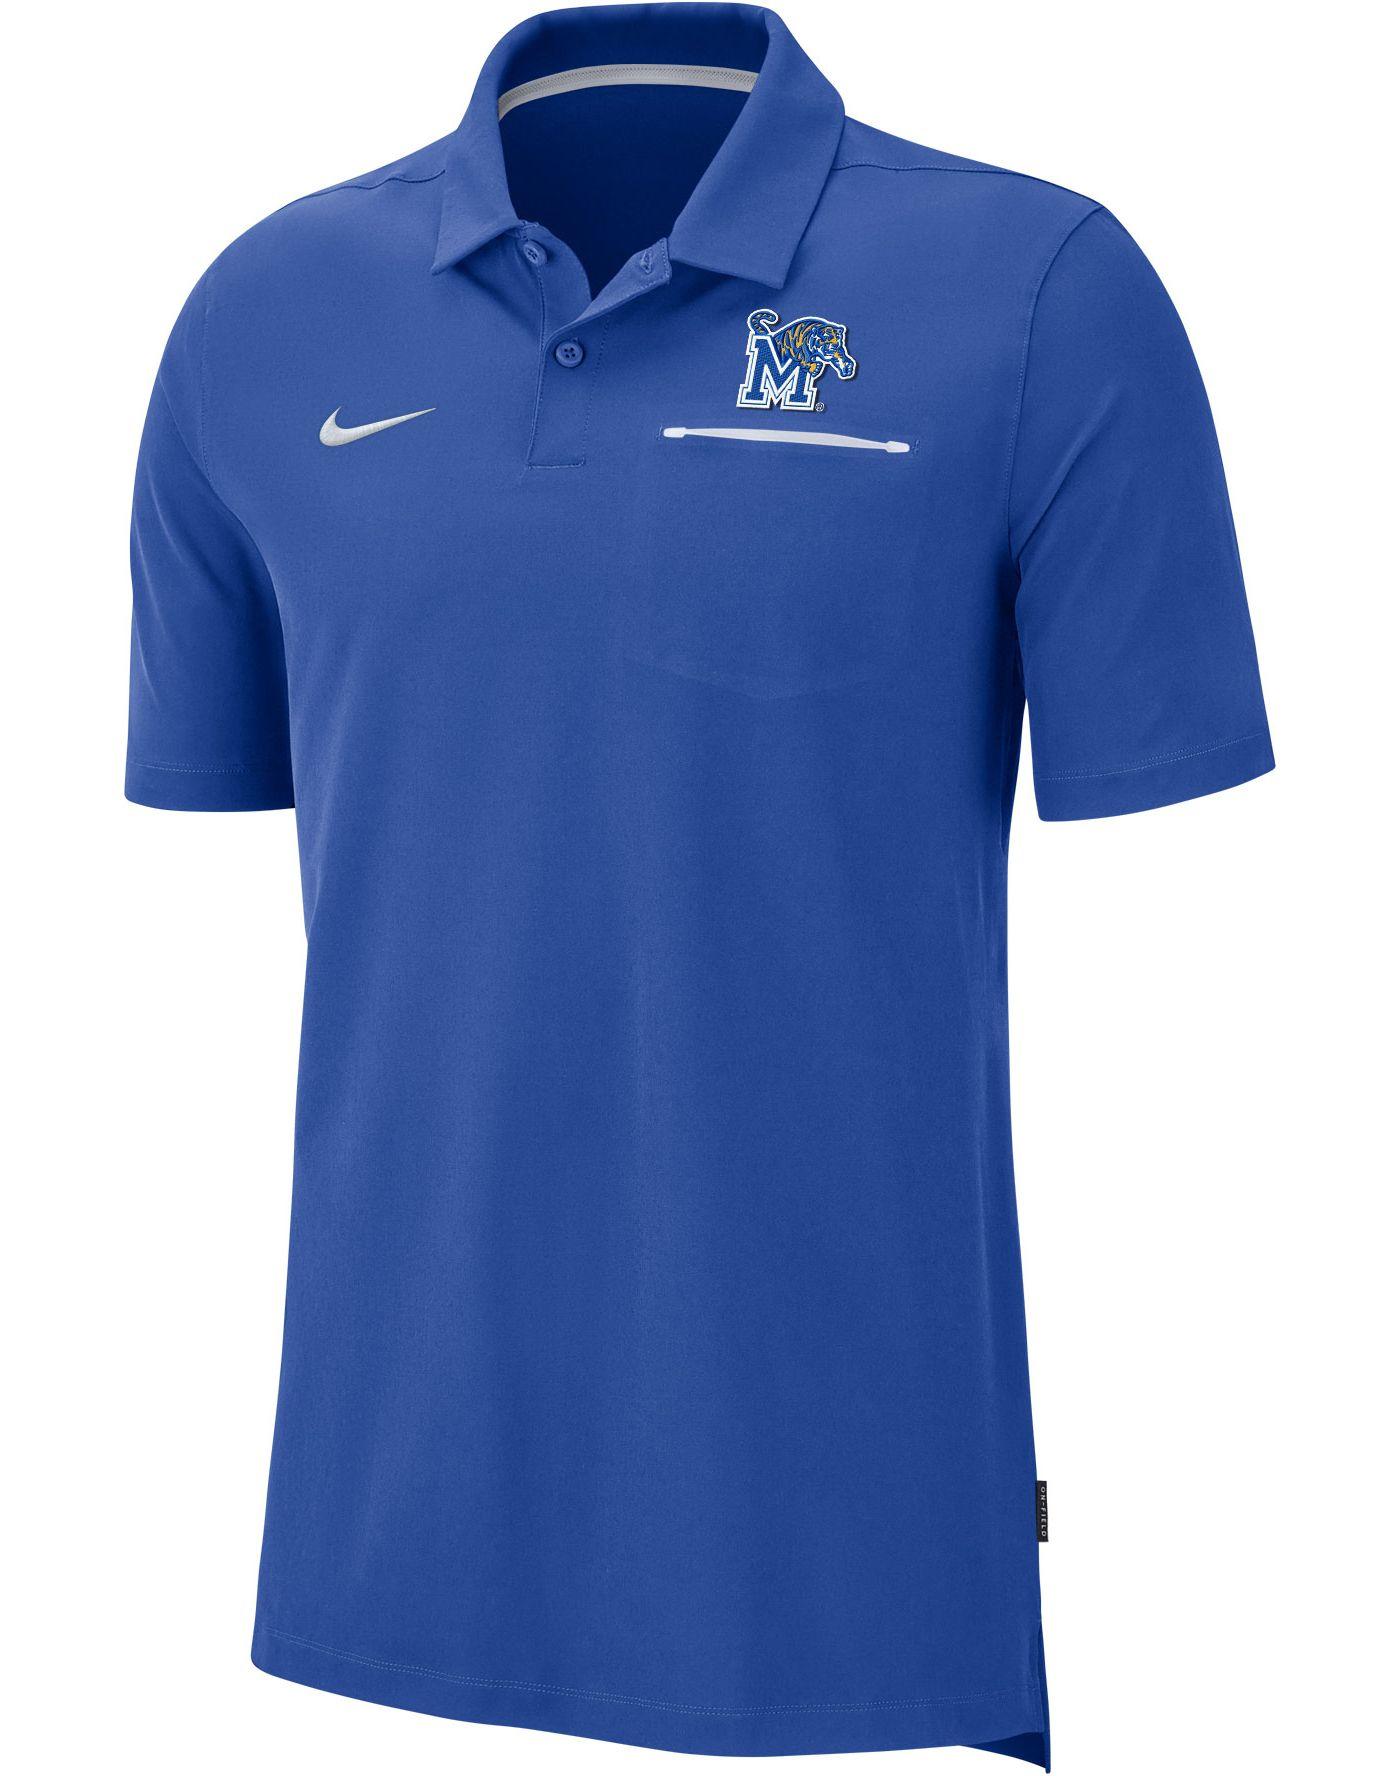 Nike Men's Memphis Tigers Blue Dri-FIT Elite Football Sideline Polo